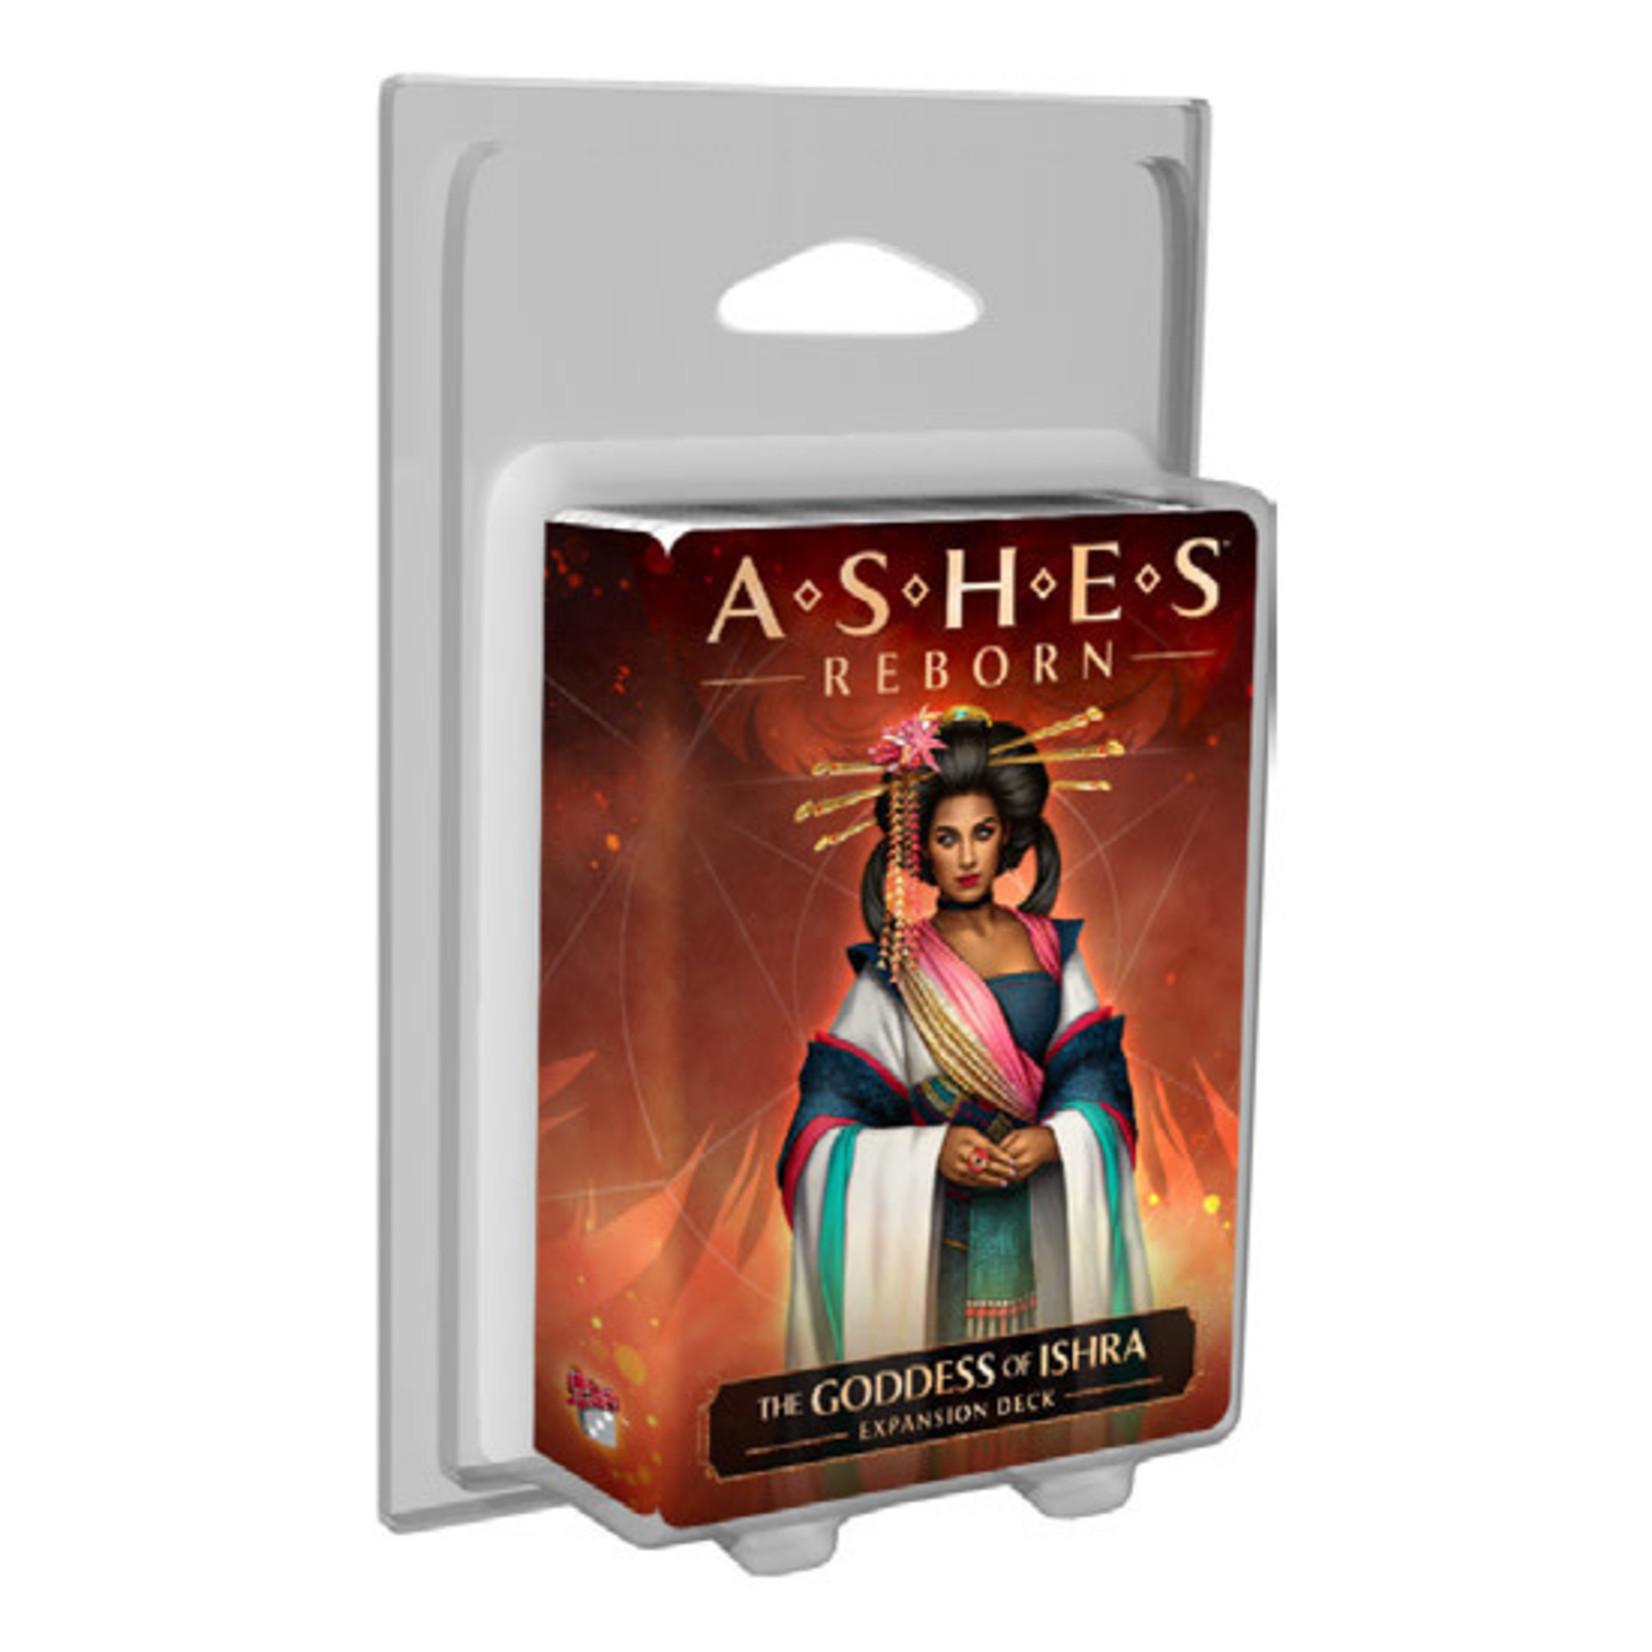 Plaid Hat Games Ashes Reborn The Goddess of Ishra